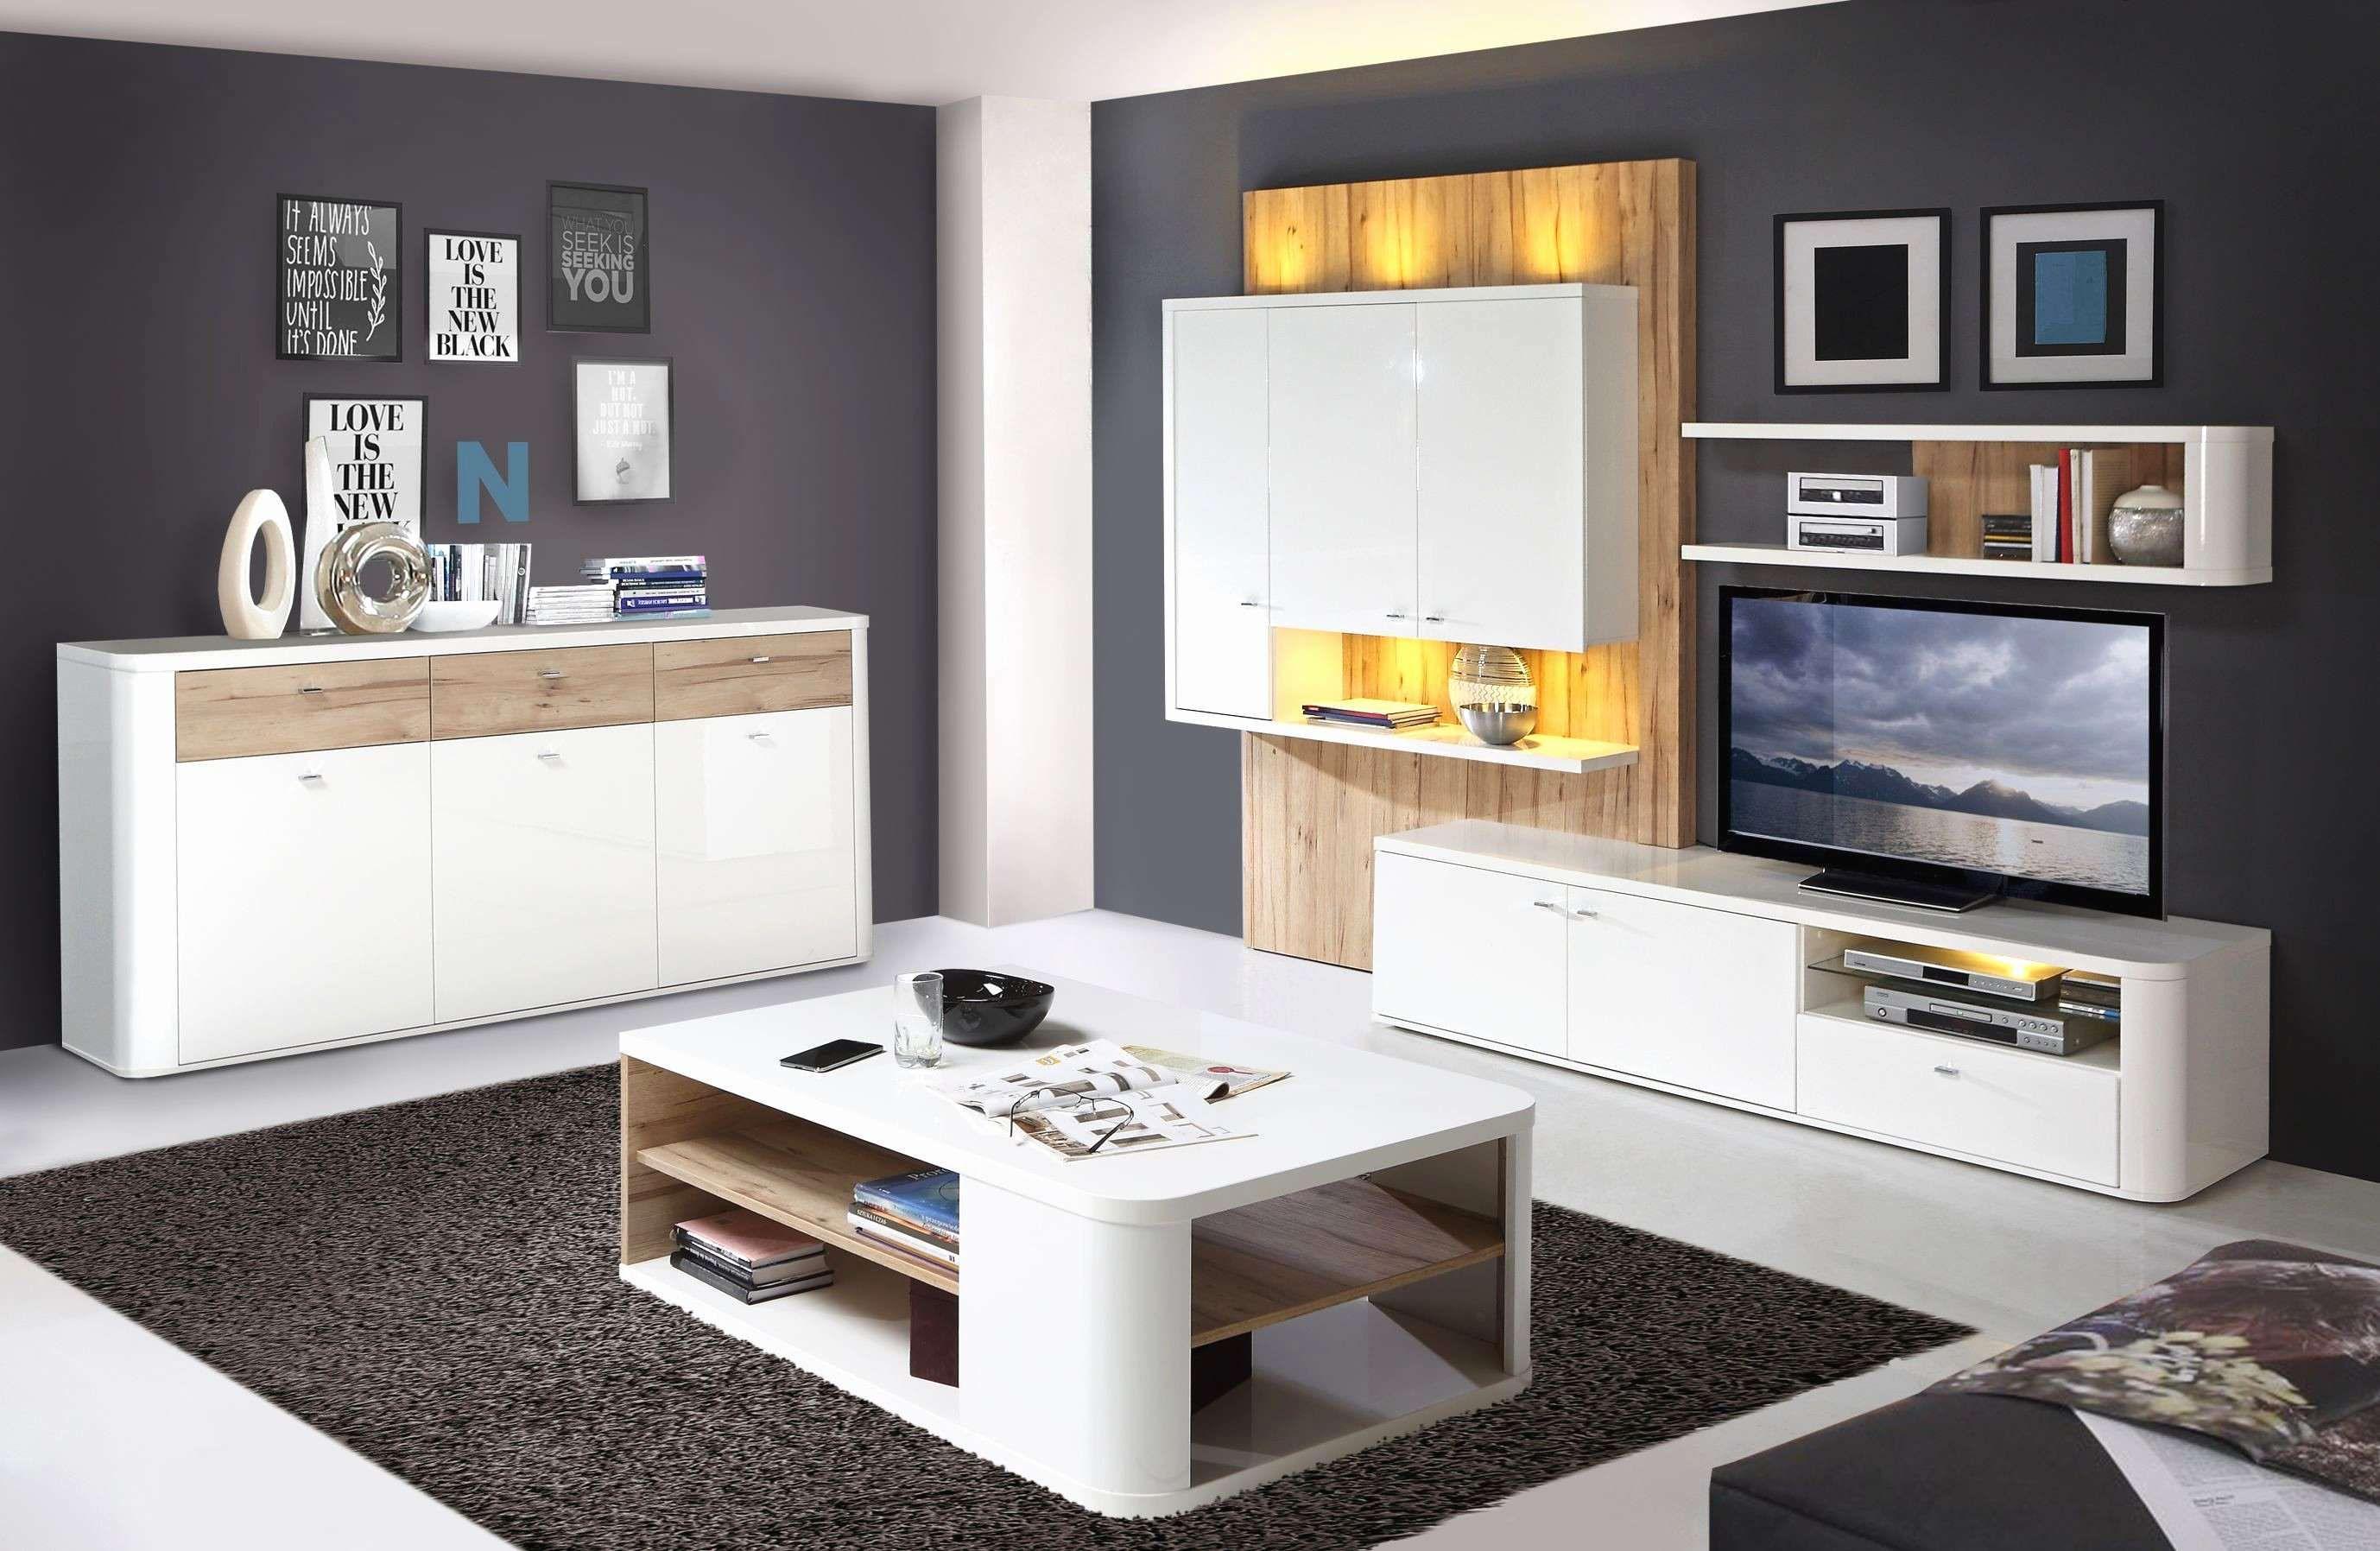 Wohnwand Modern Eiche Wohnwand Eiche Massiv Modern Bilder Wohnwand Modern Ostermann Tags In 2020 Home Decor Home Decor